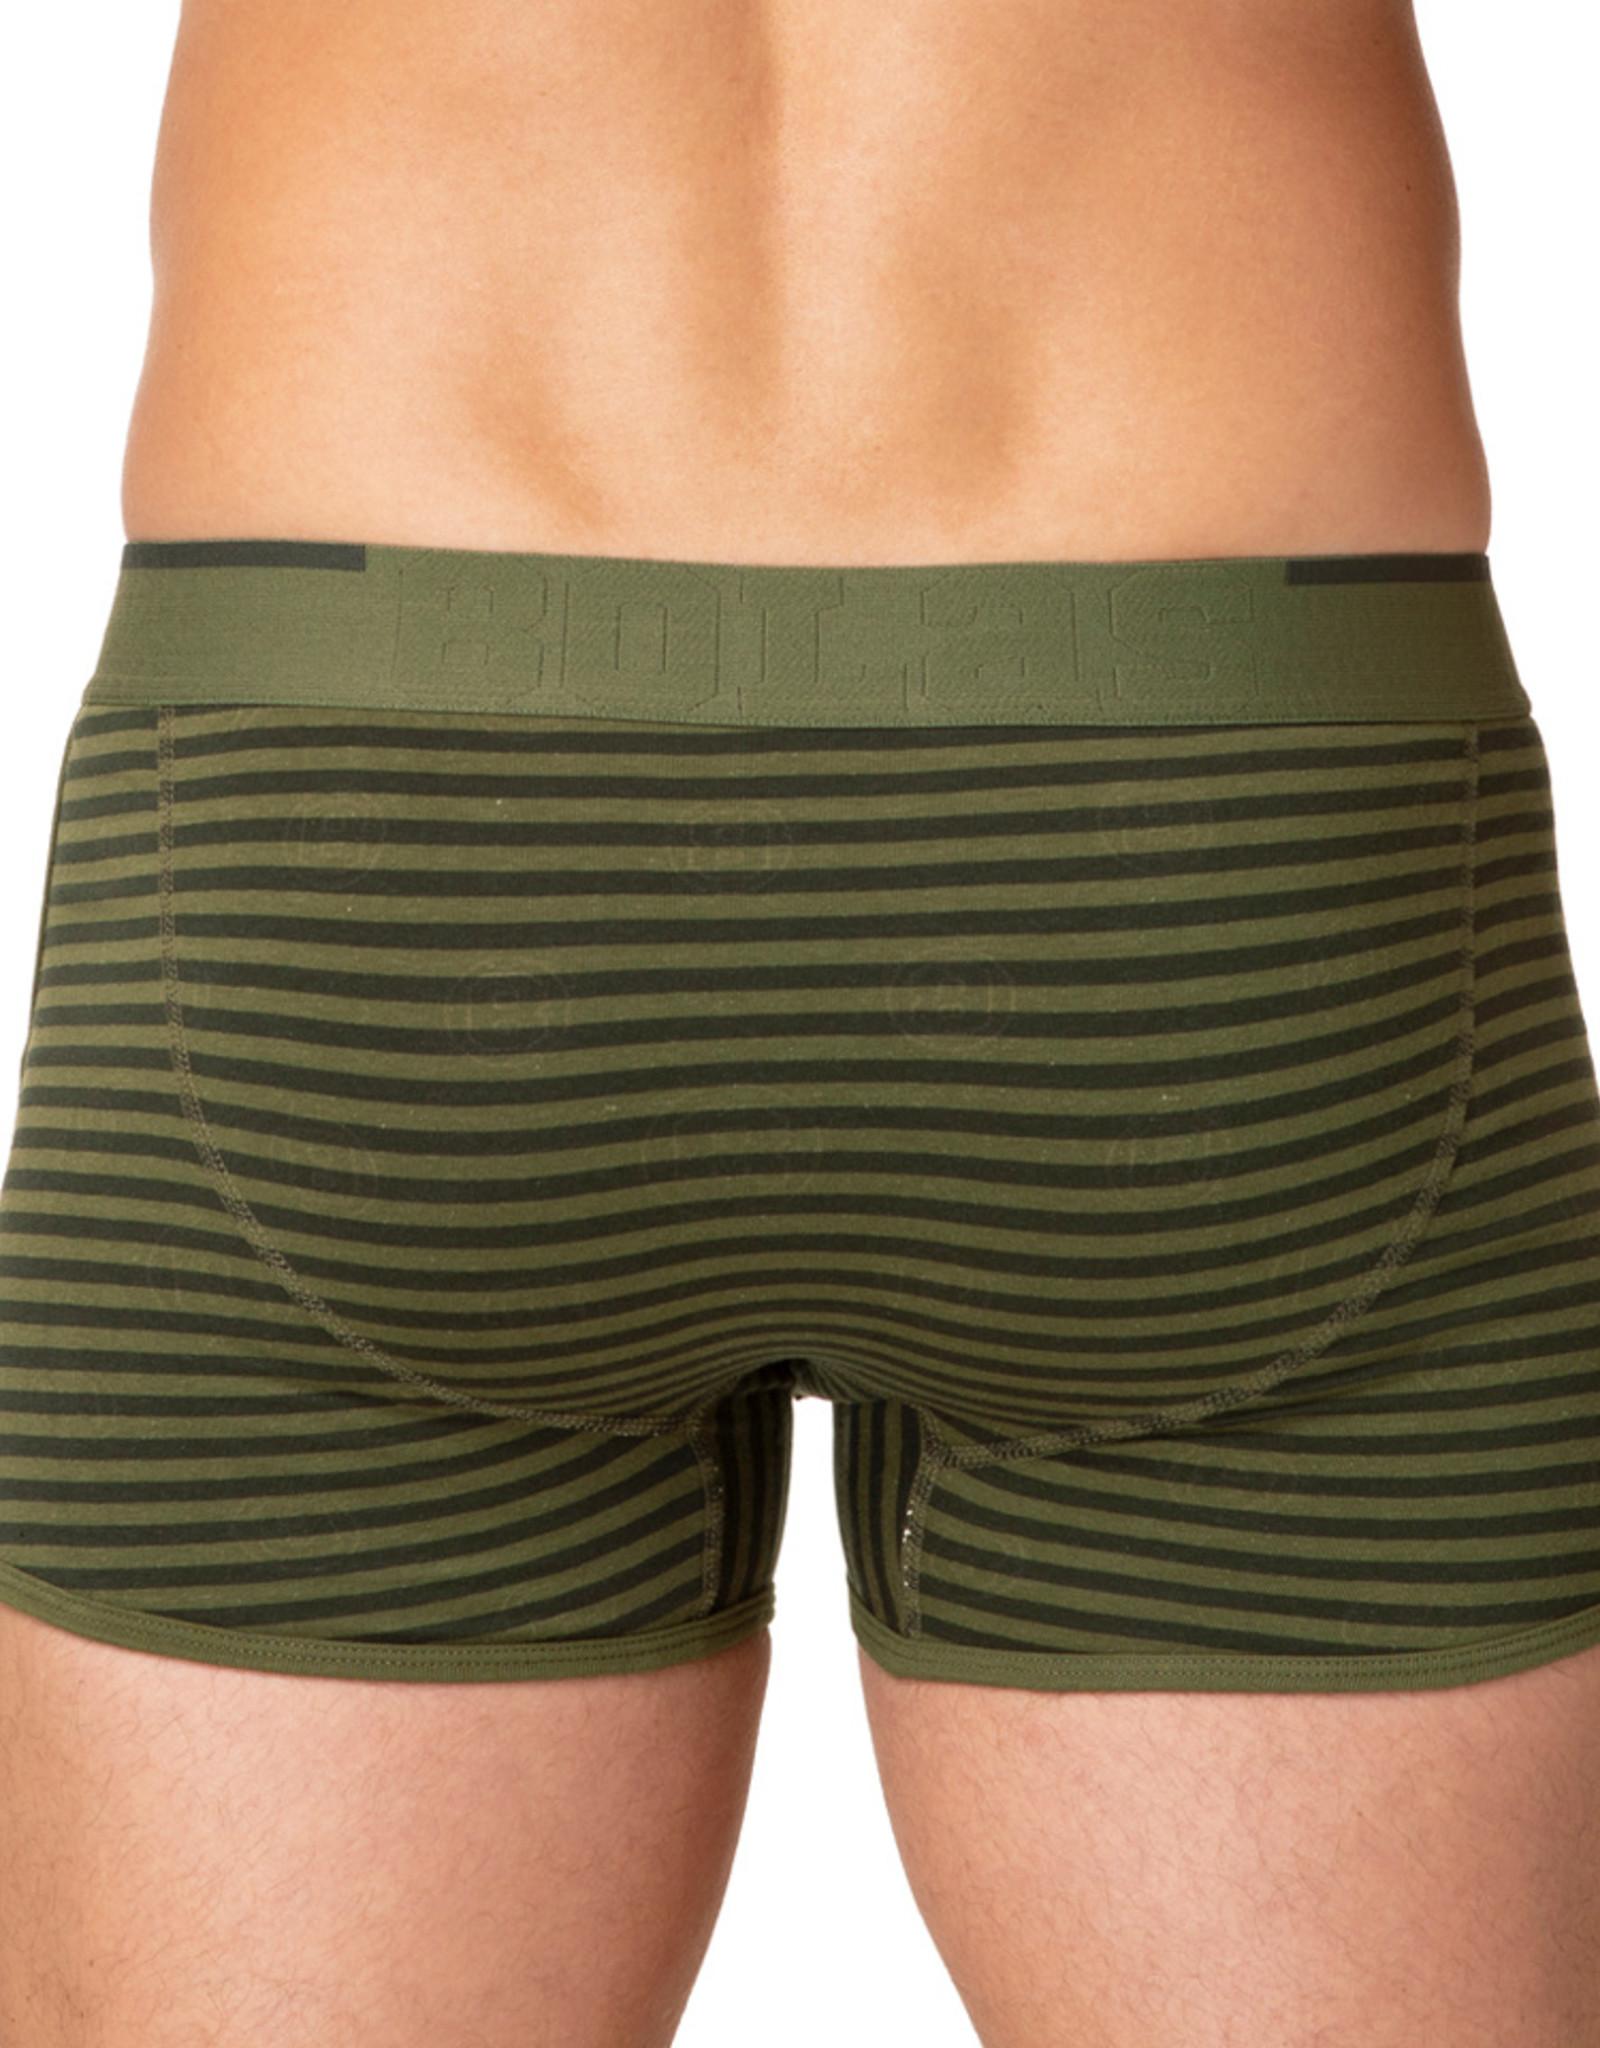 Bolas Underwear Bolas  Underwear  Green Stripes